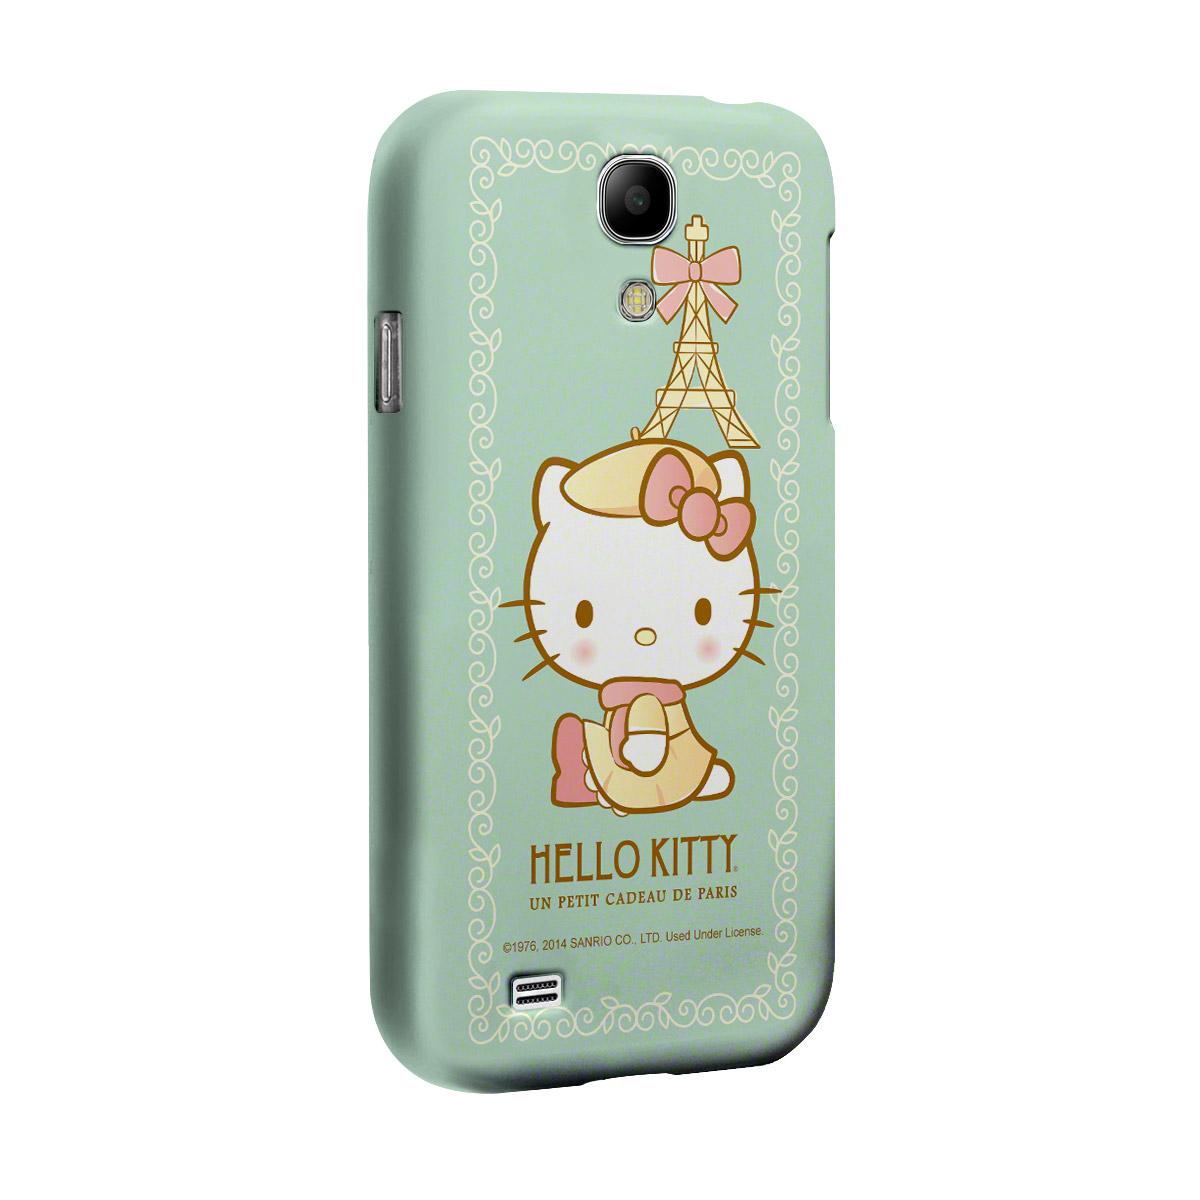 Capa de Celular Samsung S4 Hello Kitty Un Petit Cadeau